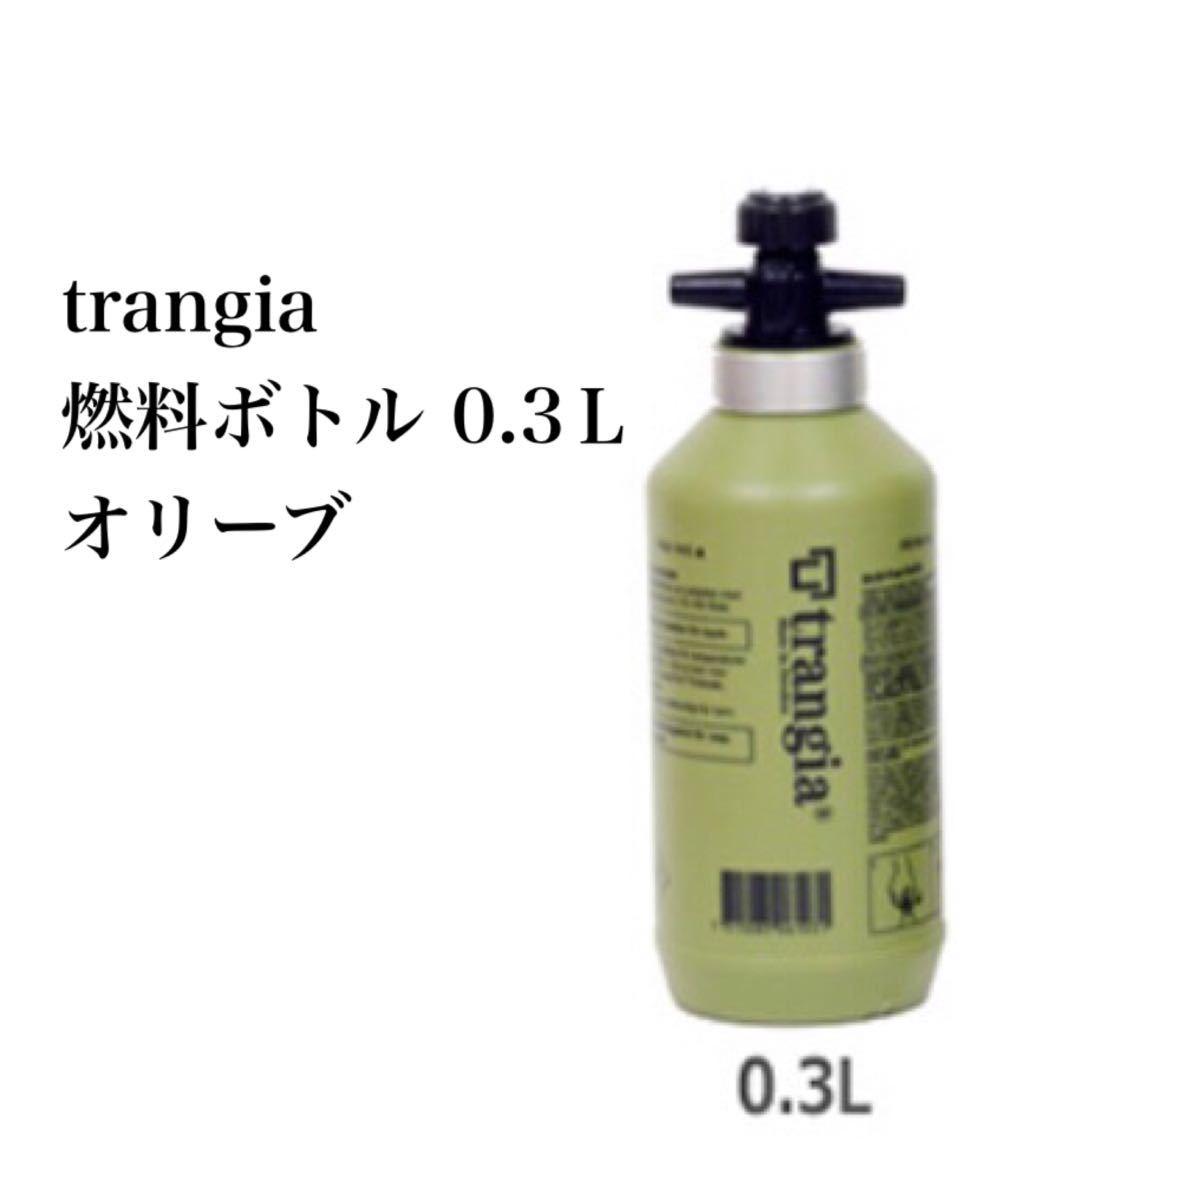 trangia トランギア フューエルボトル 0.3L オリーブ 新品 燃料ボトル